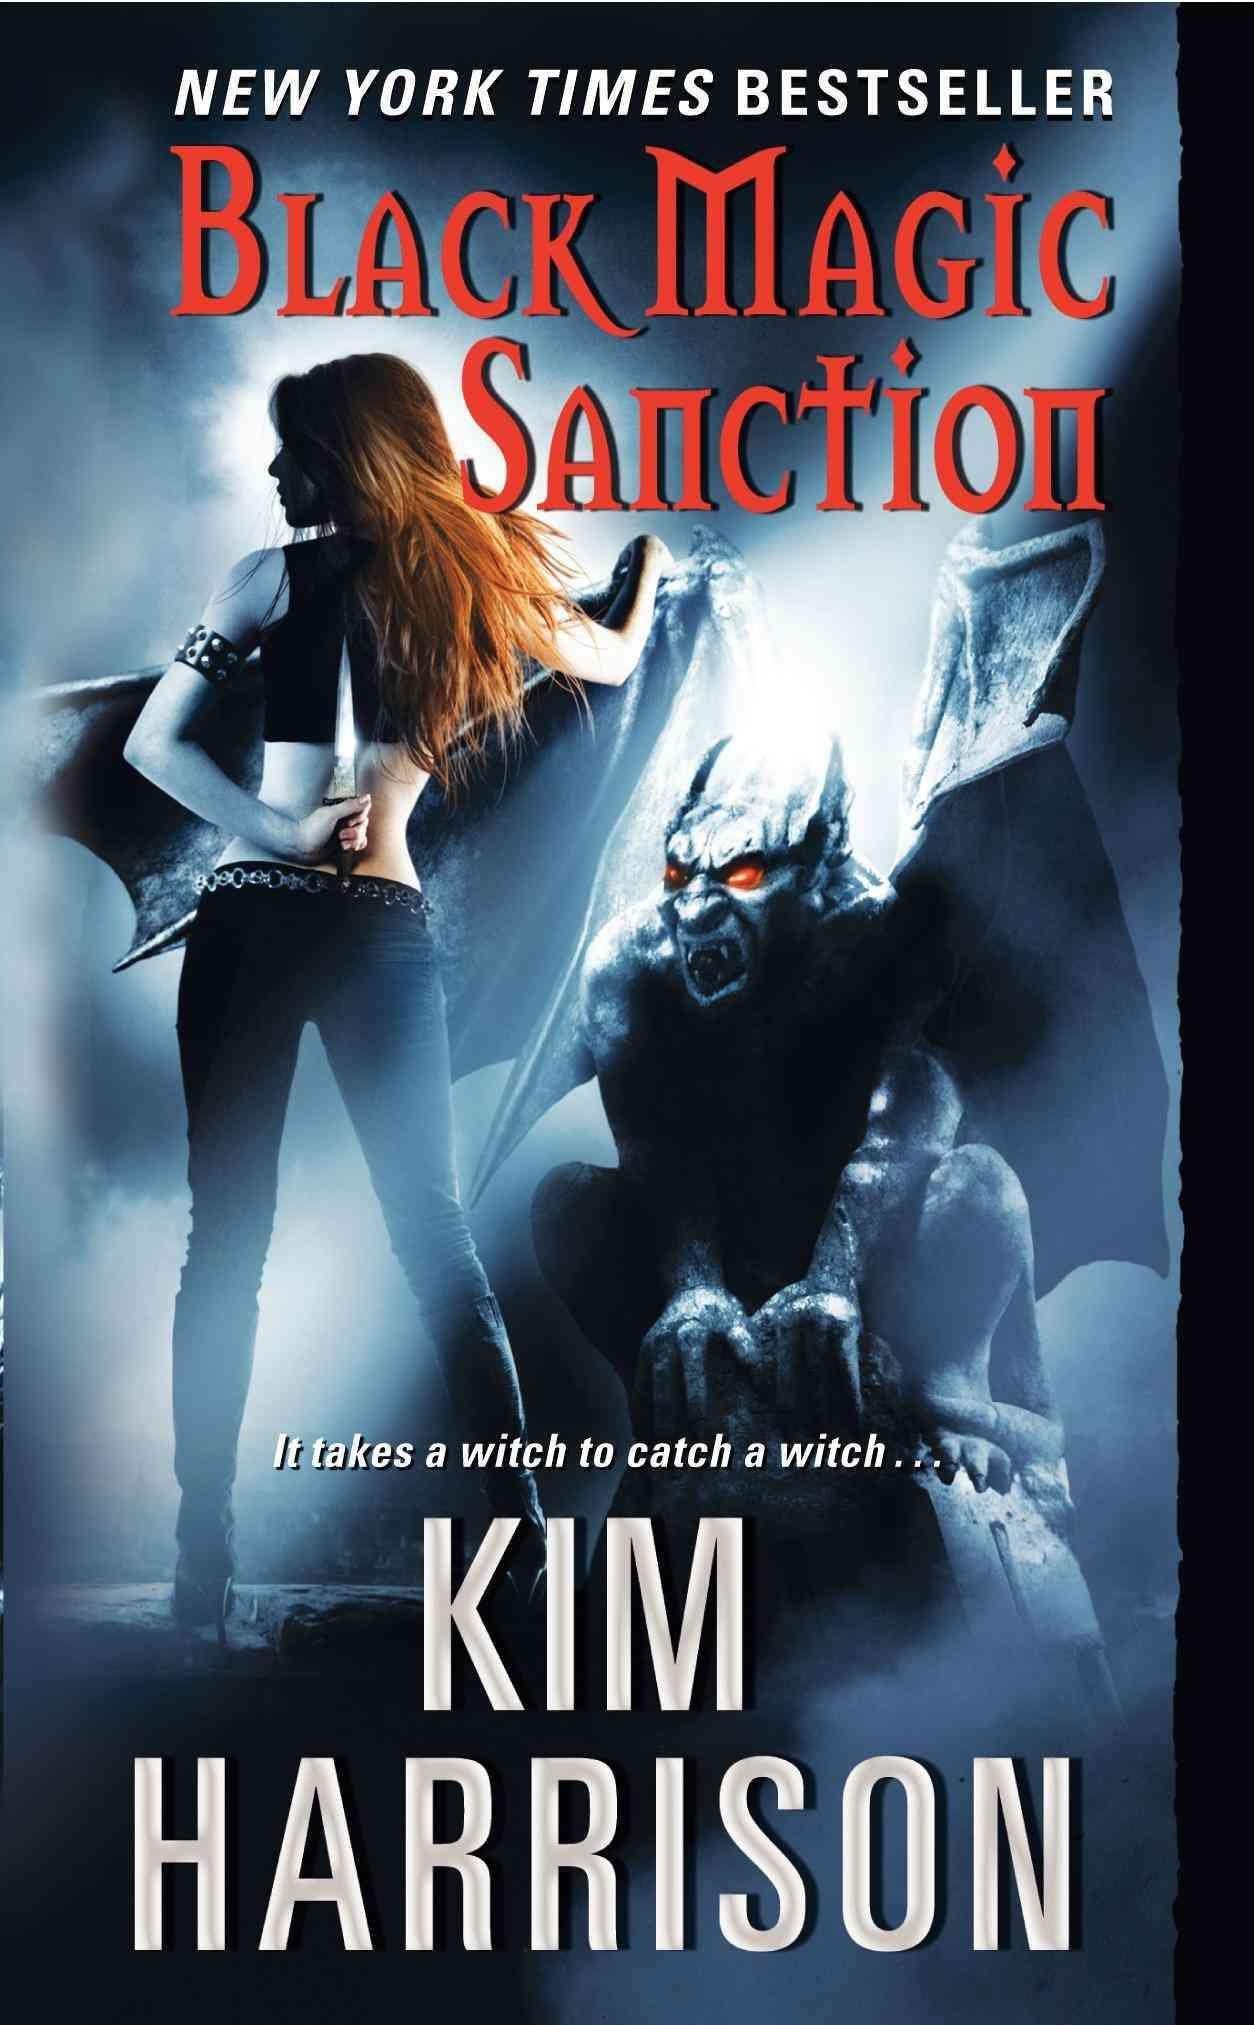 Us Paperback Cover For Black Magic Sanction By Kim Harrison  Love Books   Pinterest  Black Magic And Black